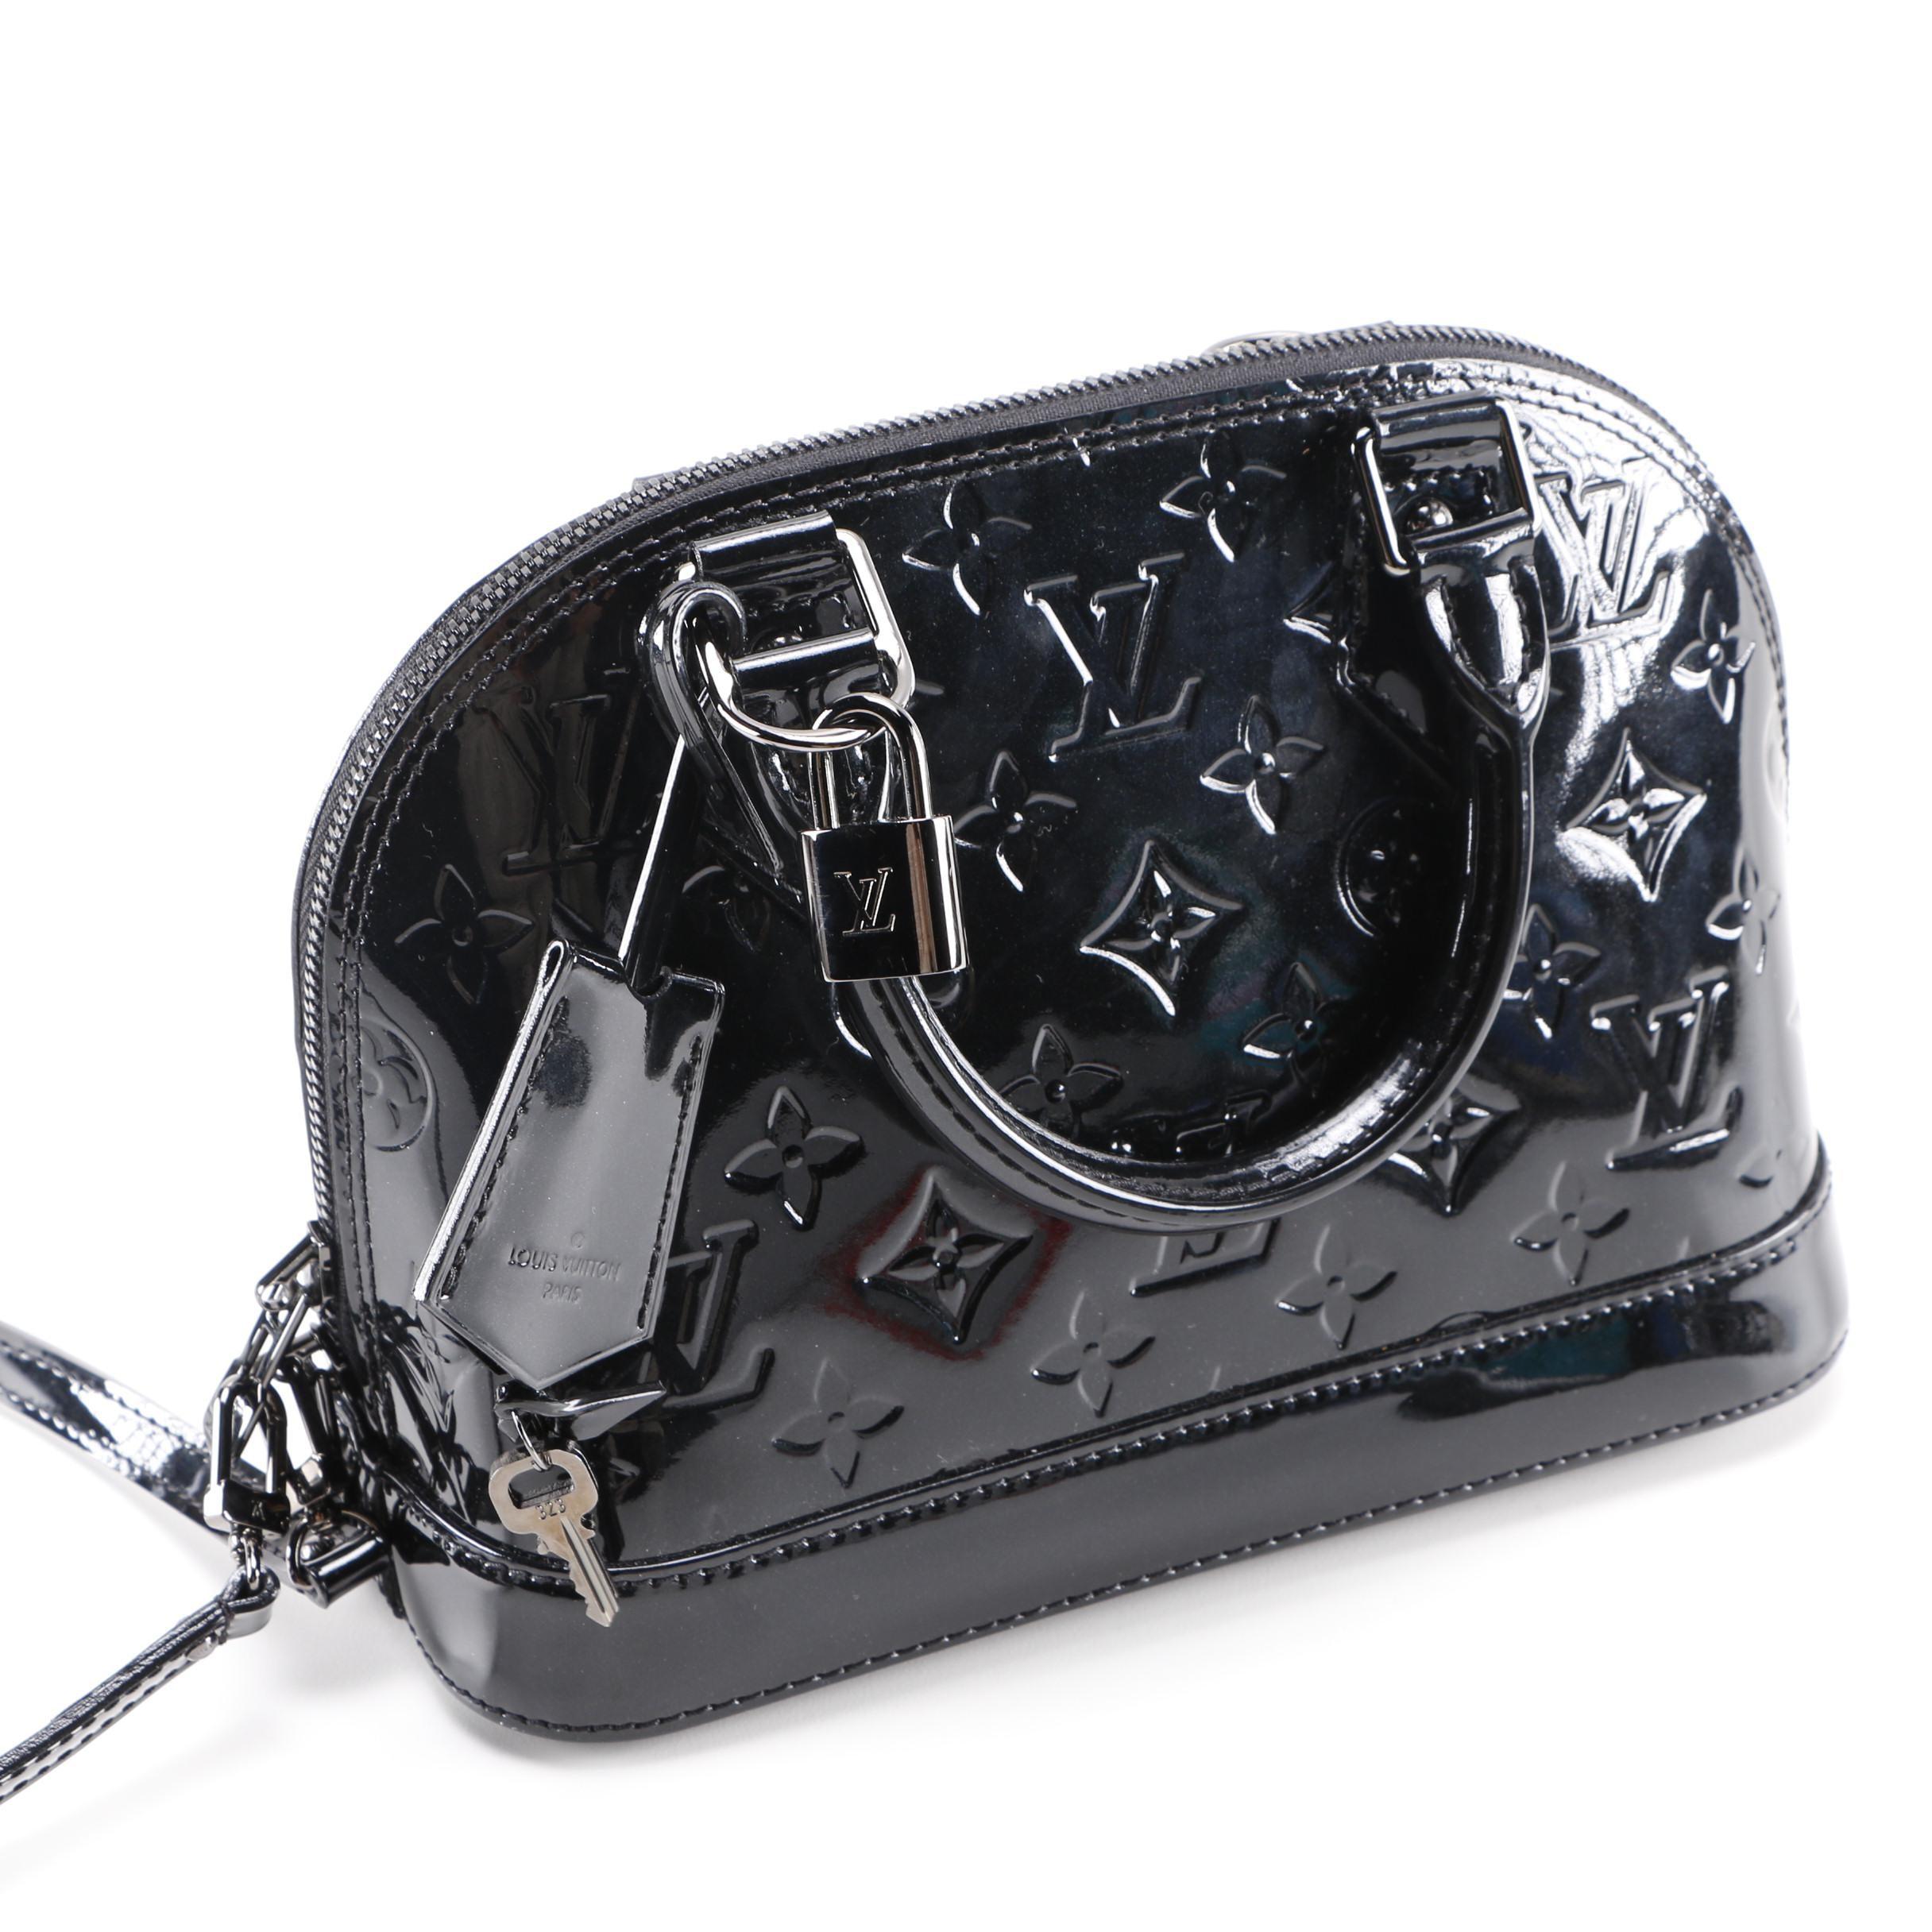 Louis Vuitton Alma BB Bag in Black Magnetique Vernis Leather